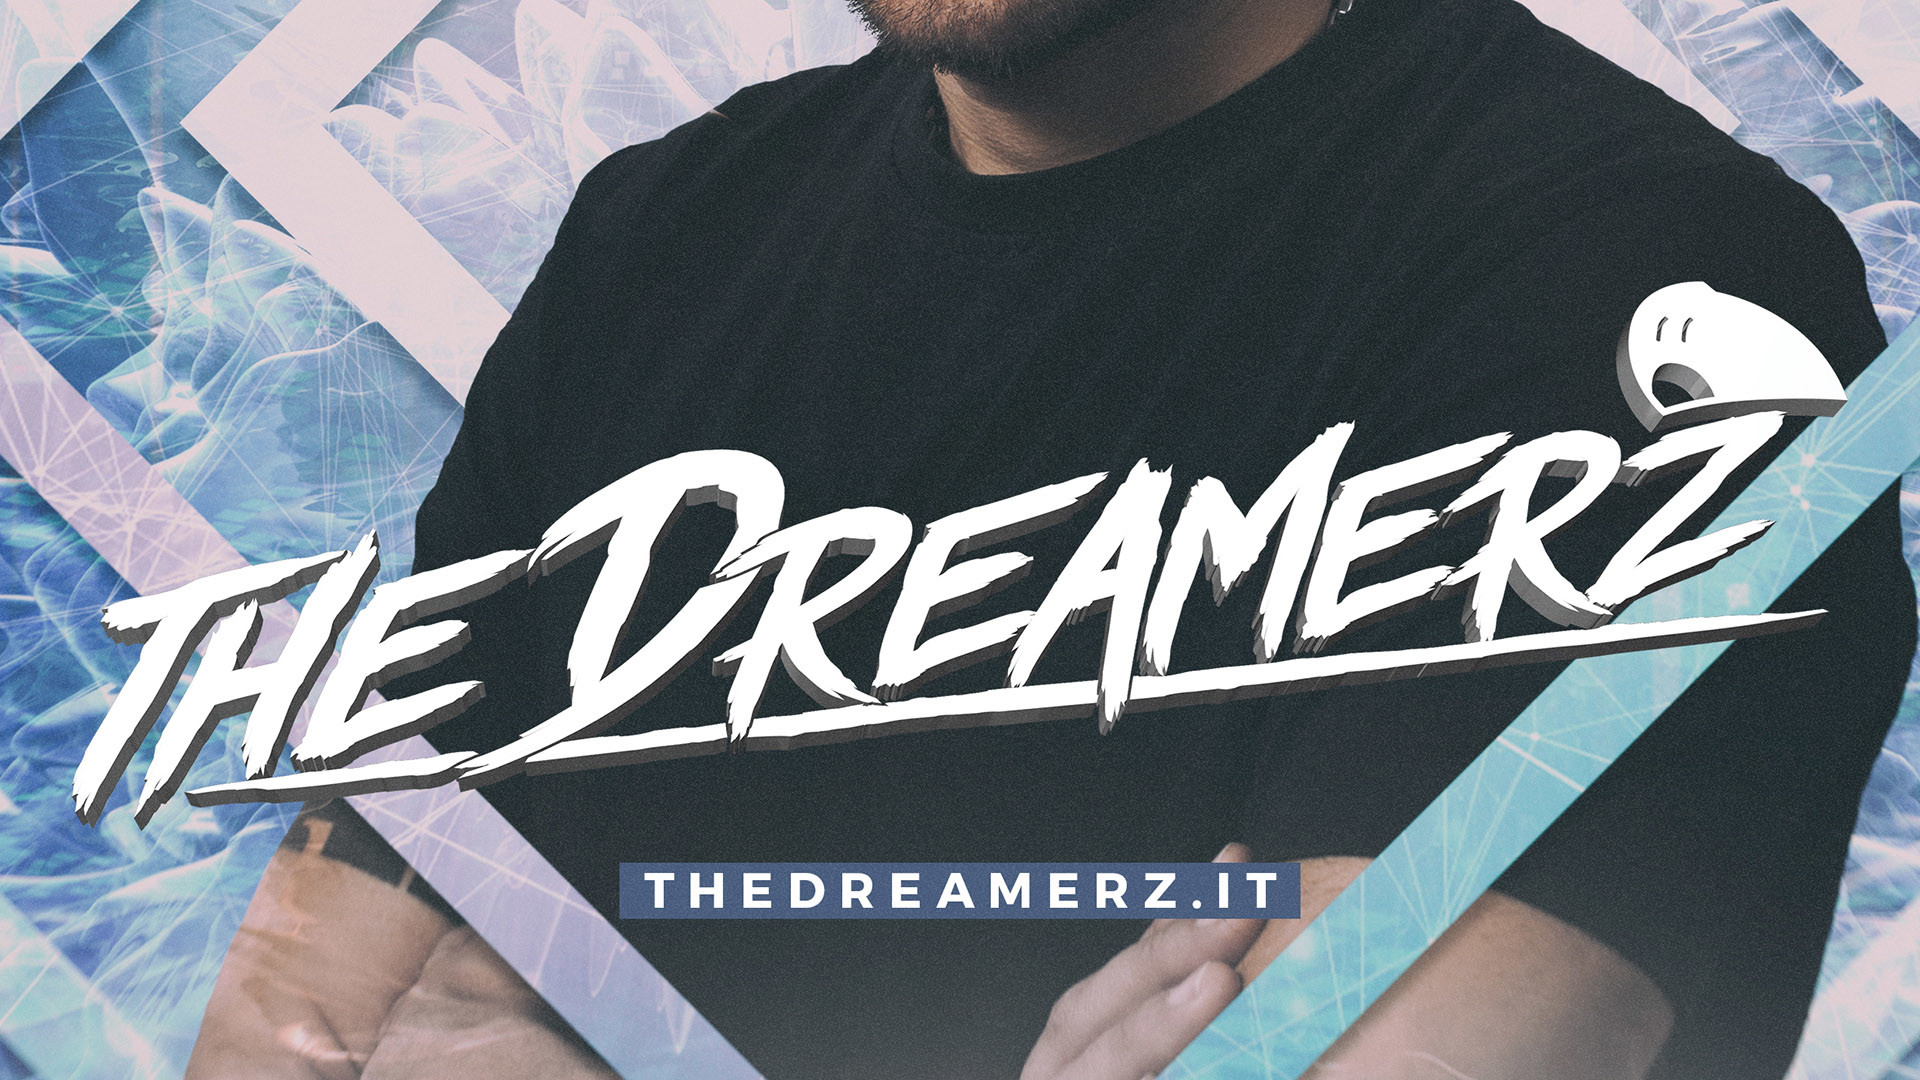 Cristian ricardi thedreamerz artwork detail4